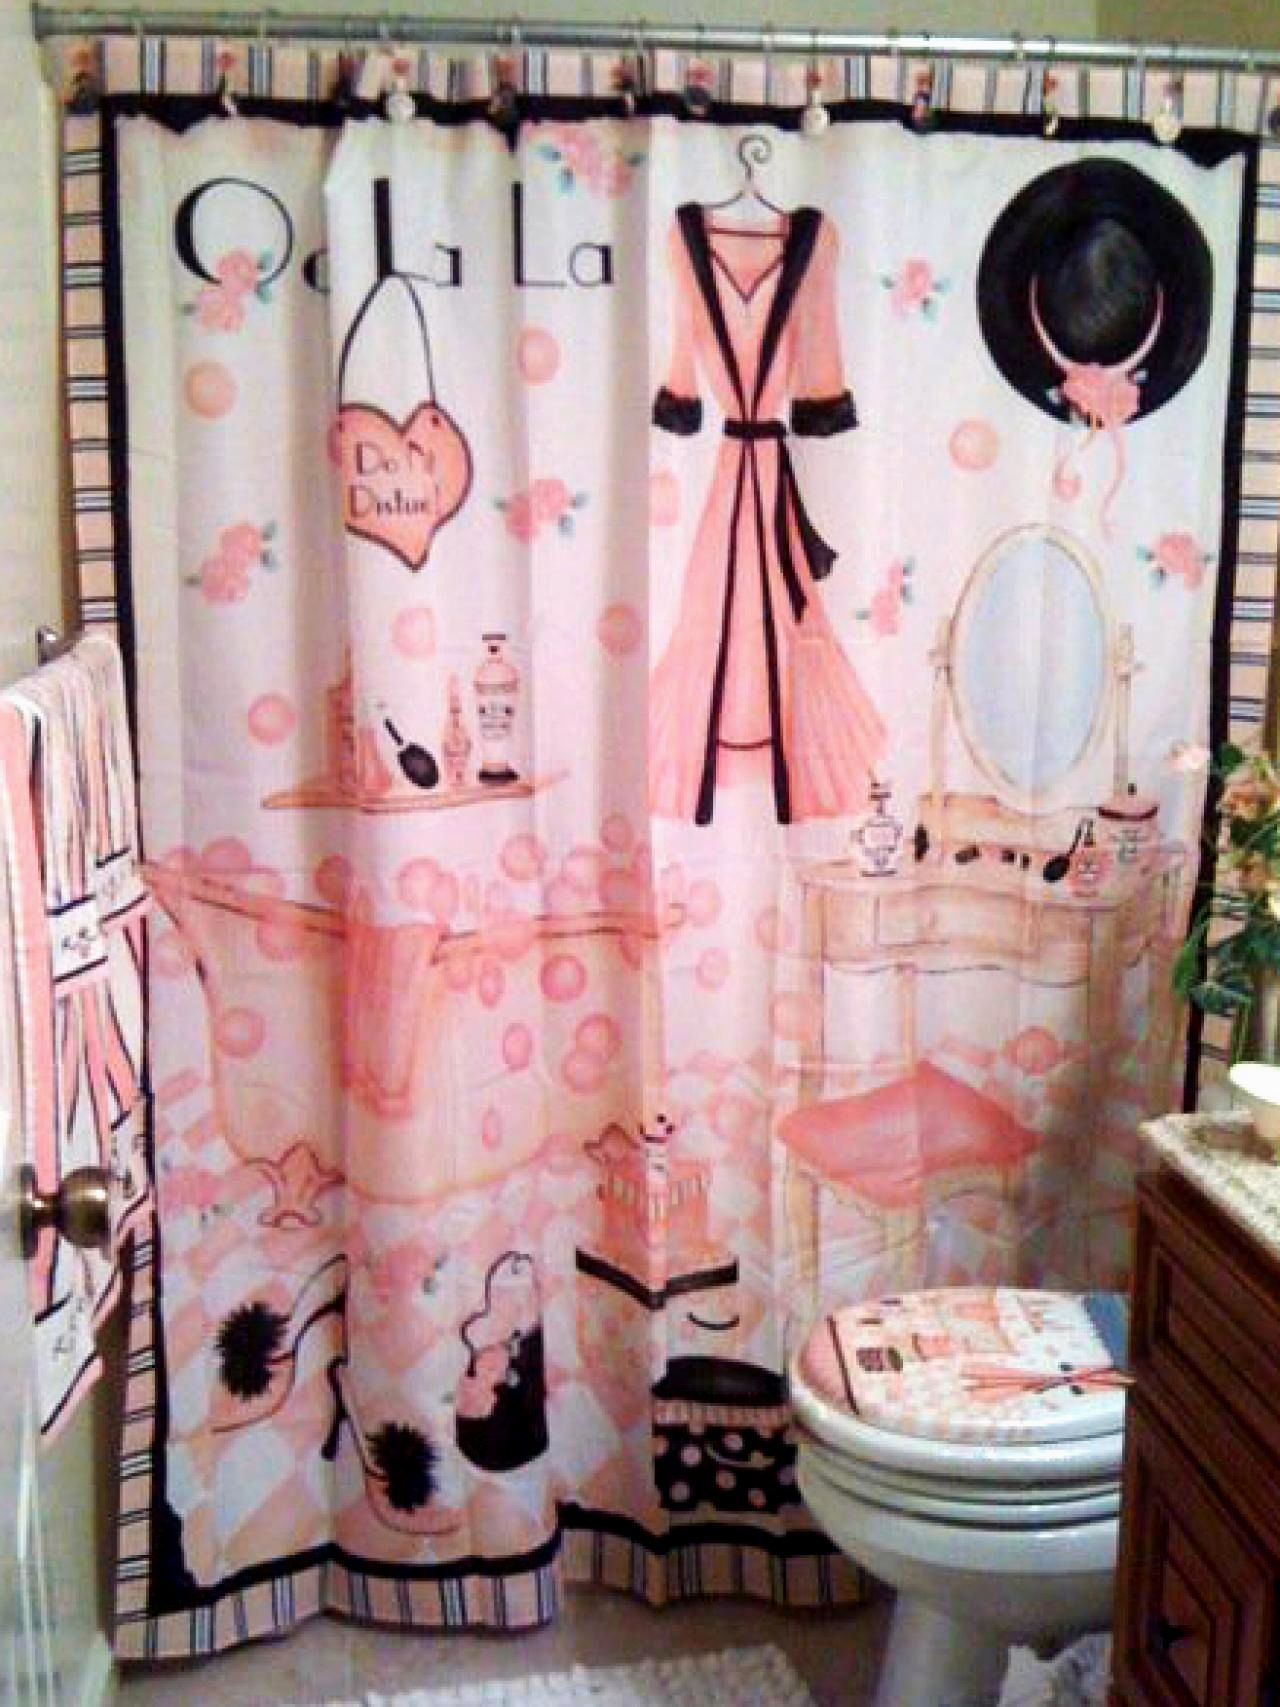 cool bathroom trash can design-Inspirational Bathroom Trash Can Photo